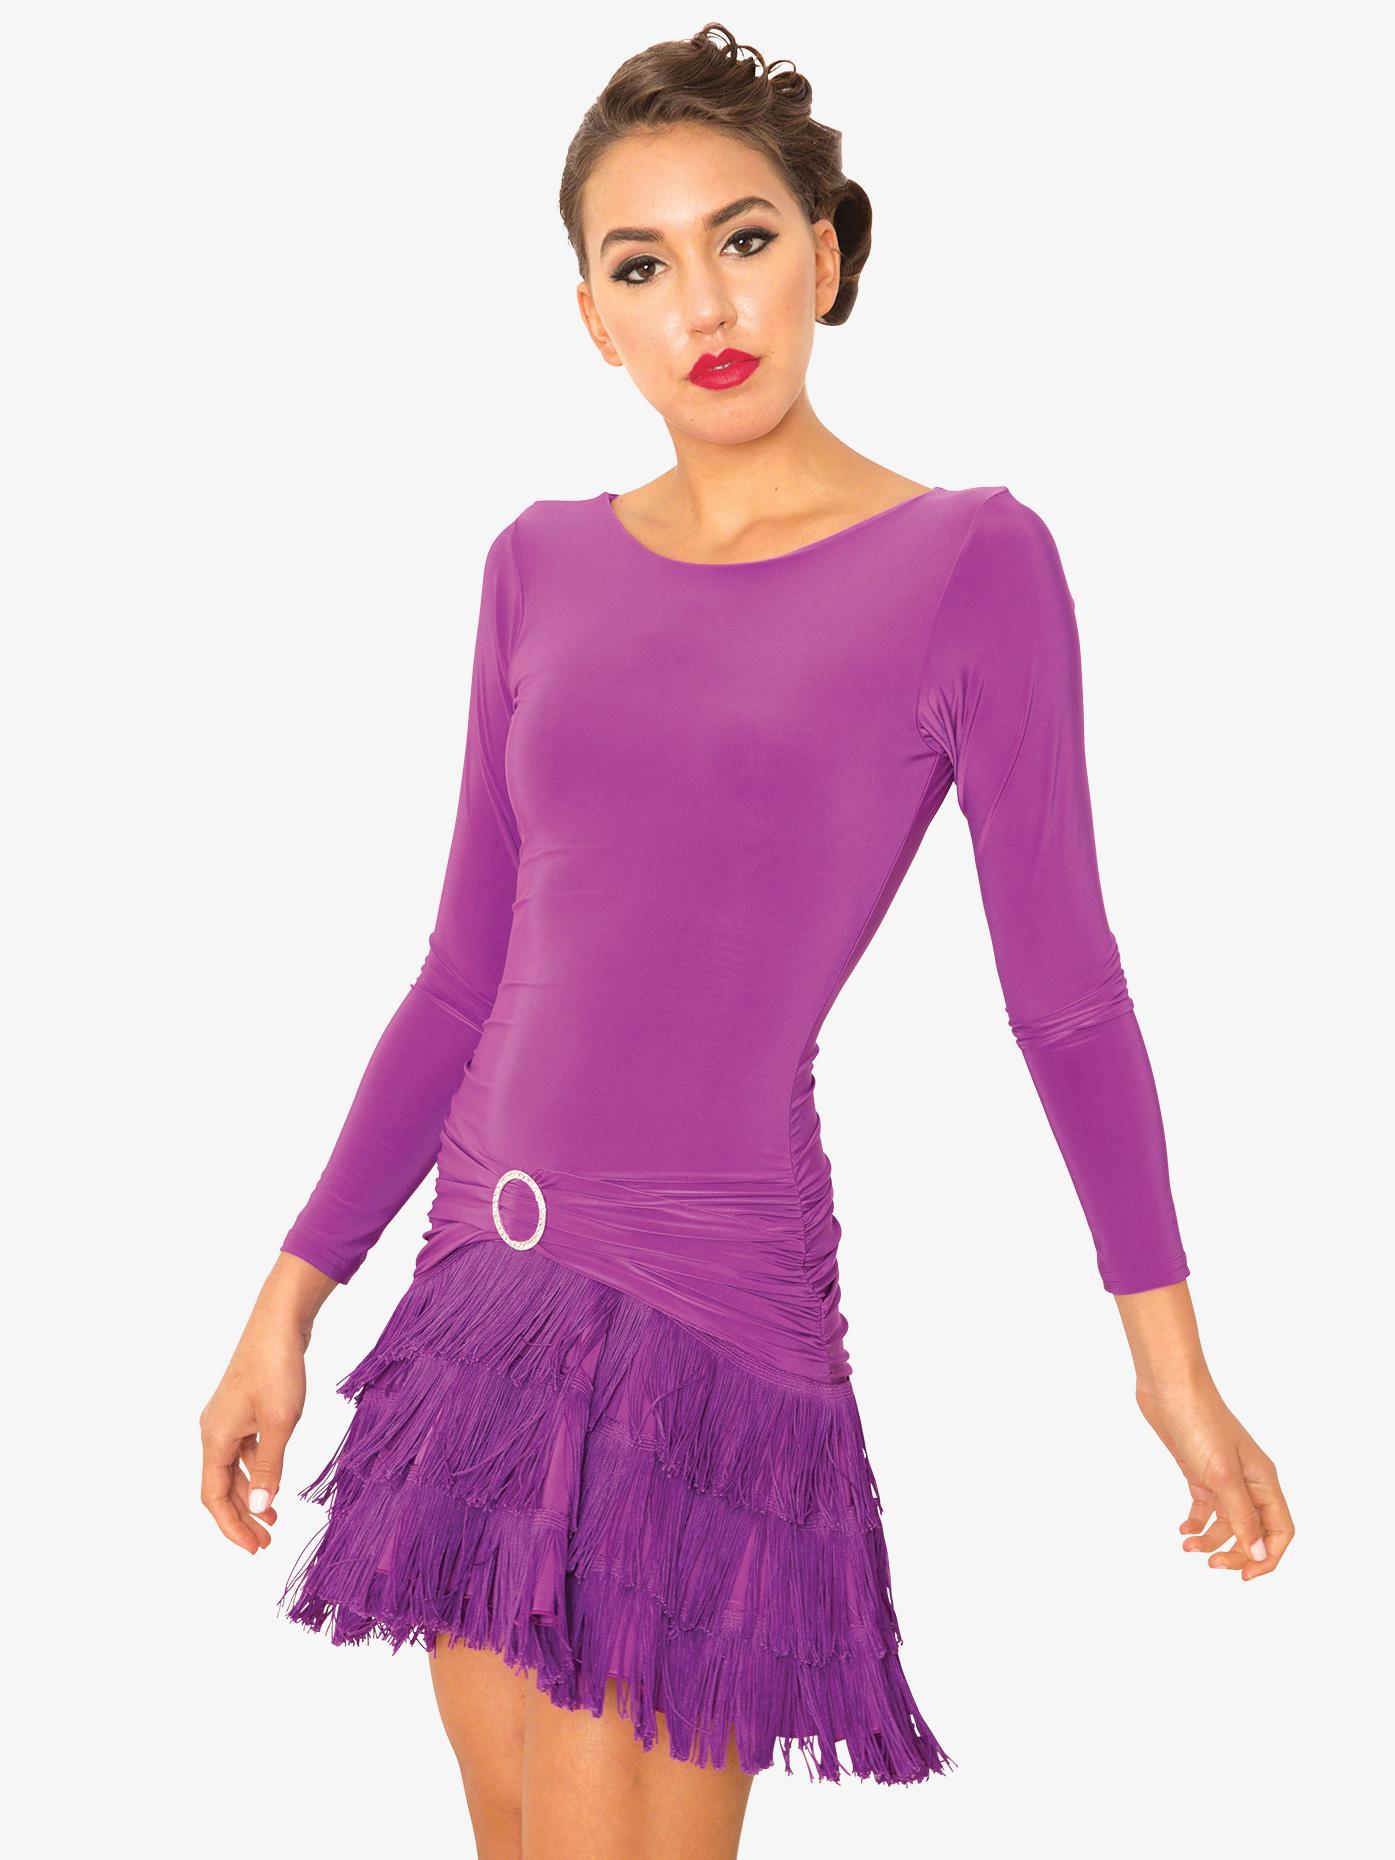 Womens Fringe Long Sleeve Ballroom Dance Dress Style No D812 Loading Zoom